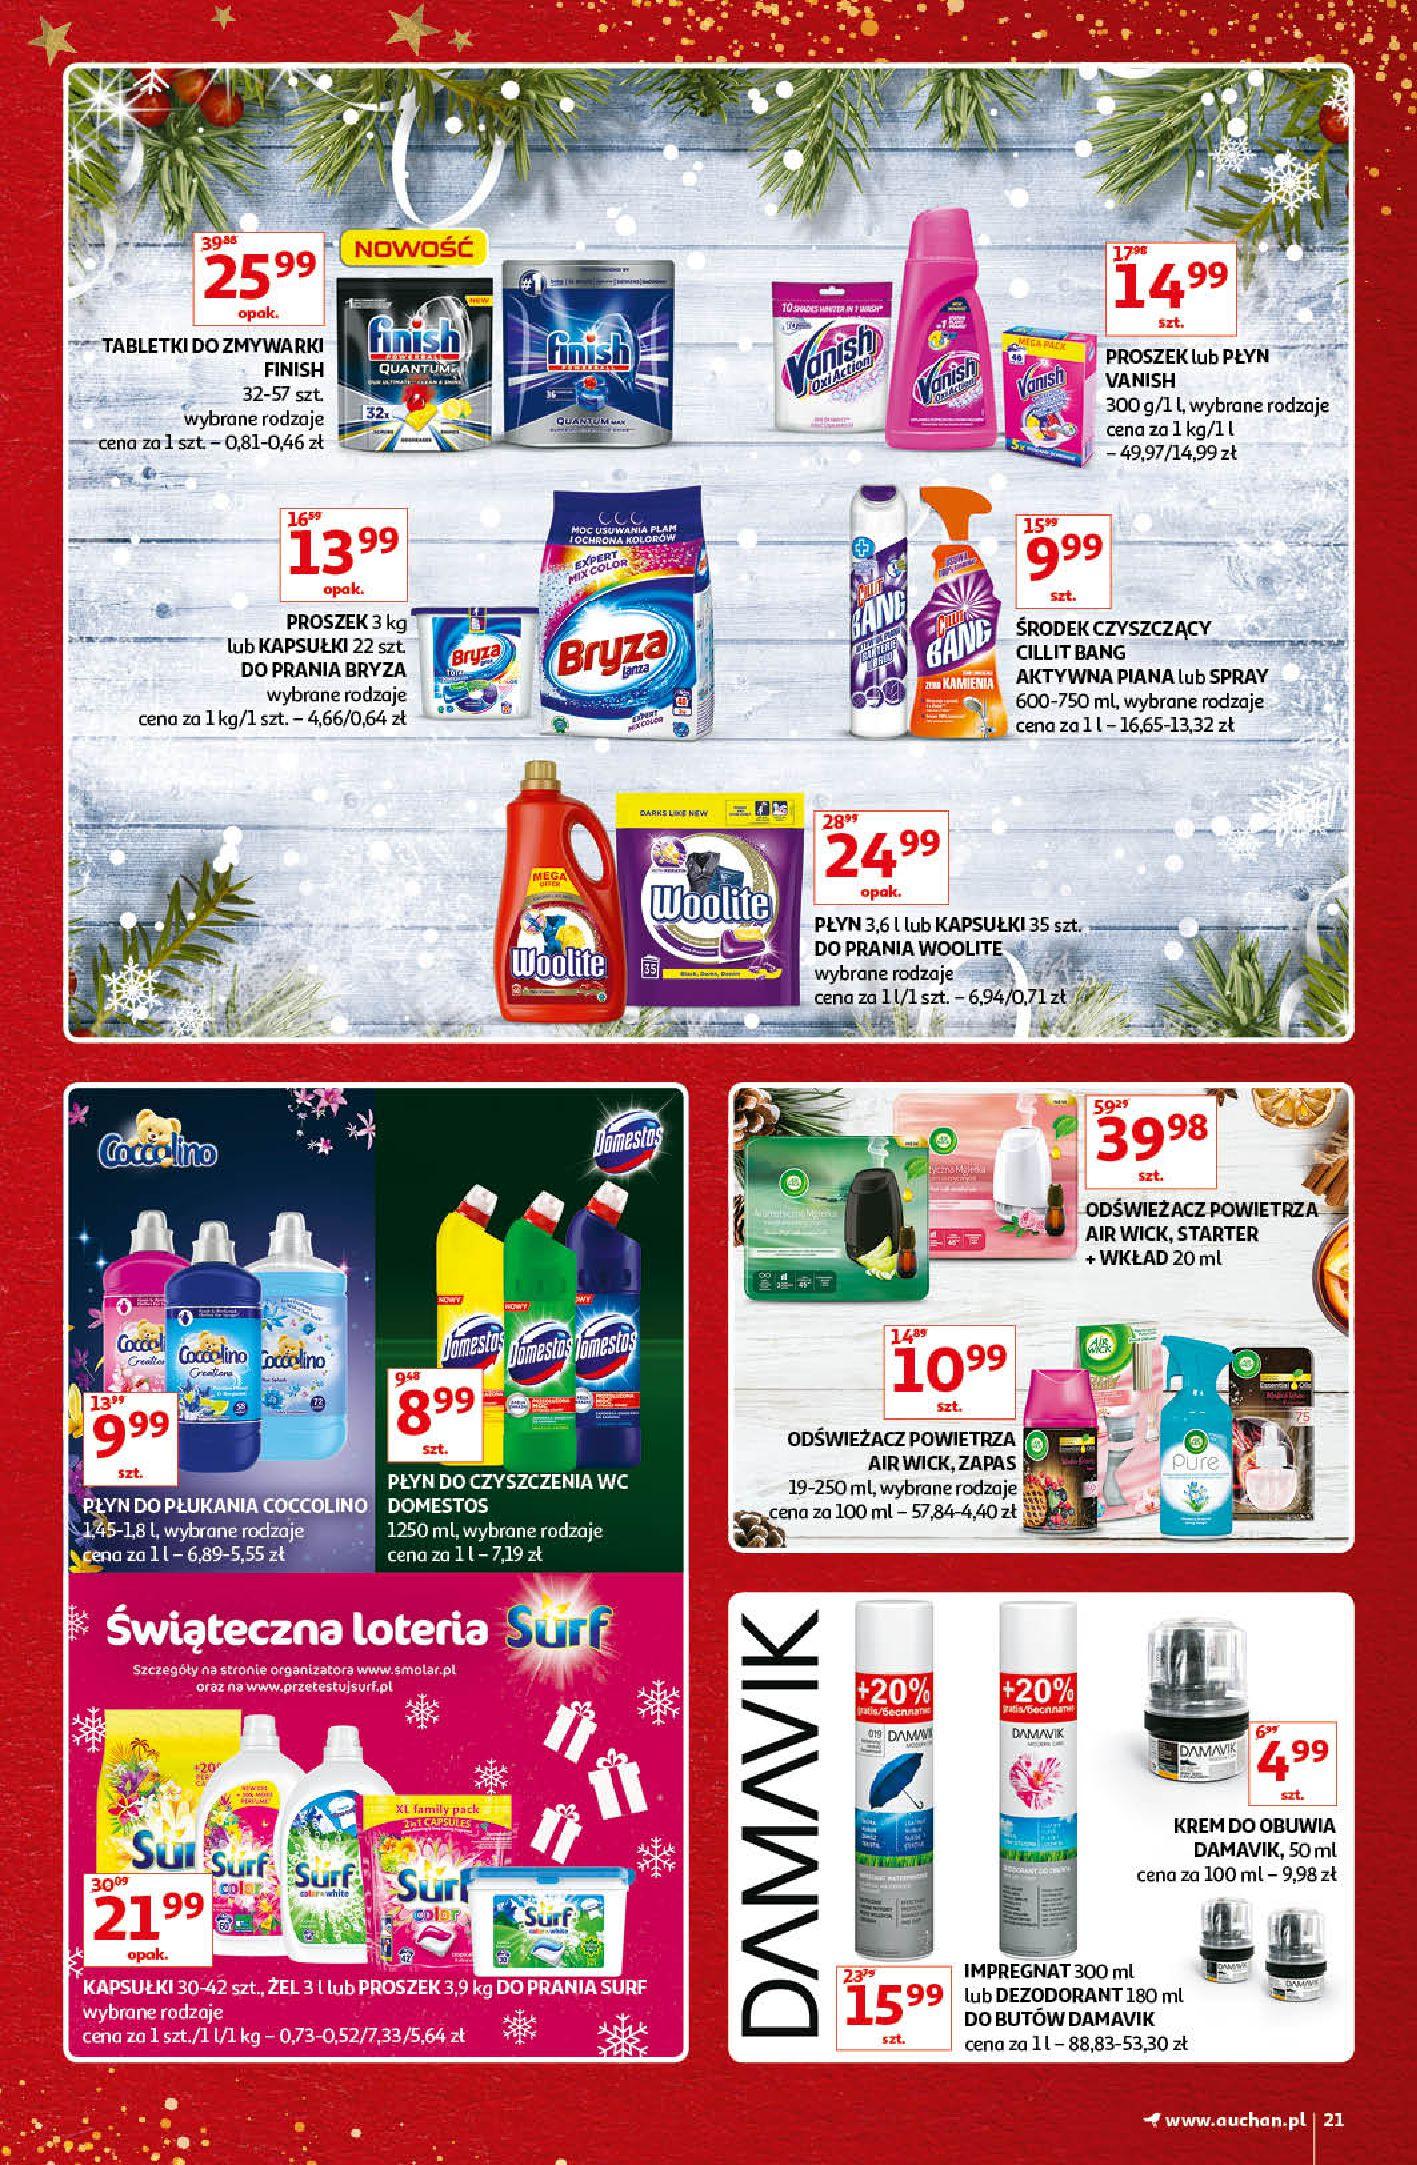 Gazetka Auchan - Kultowe Marki Hipermarkety-04.12.2019-15.12.2019-page-21